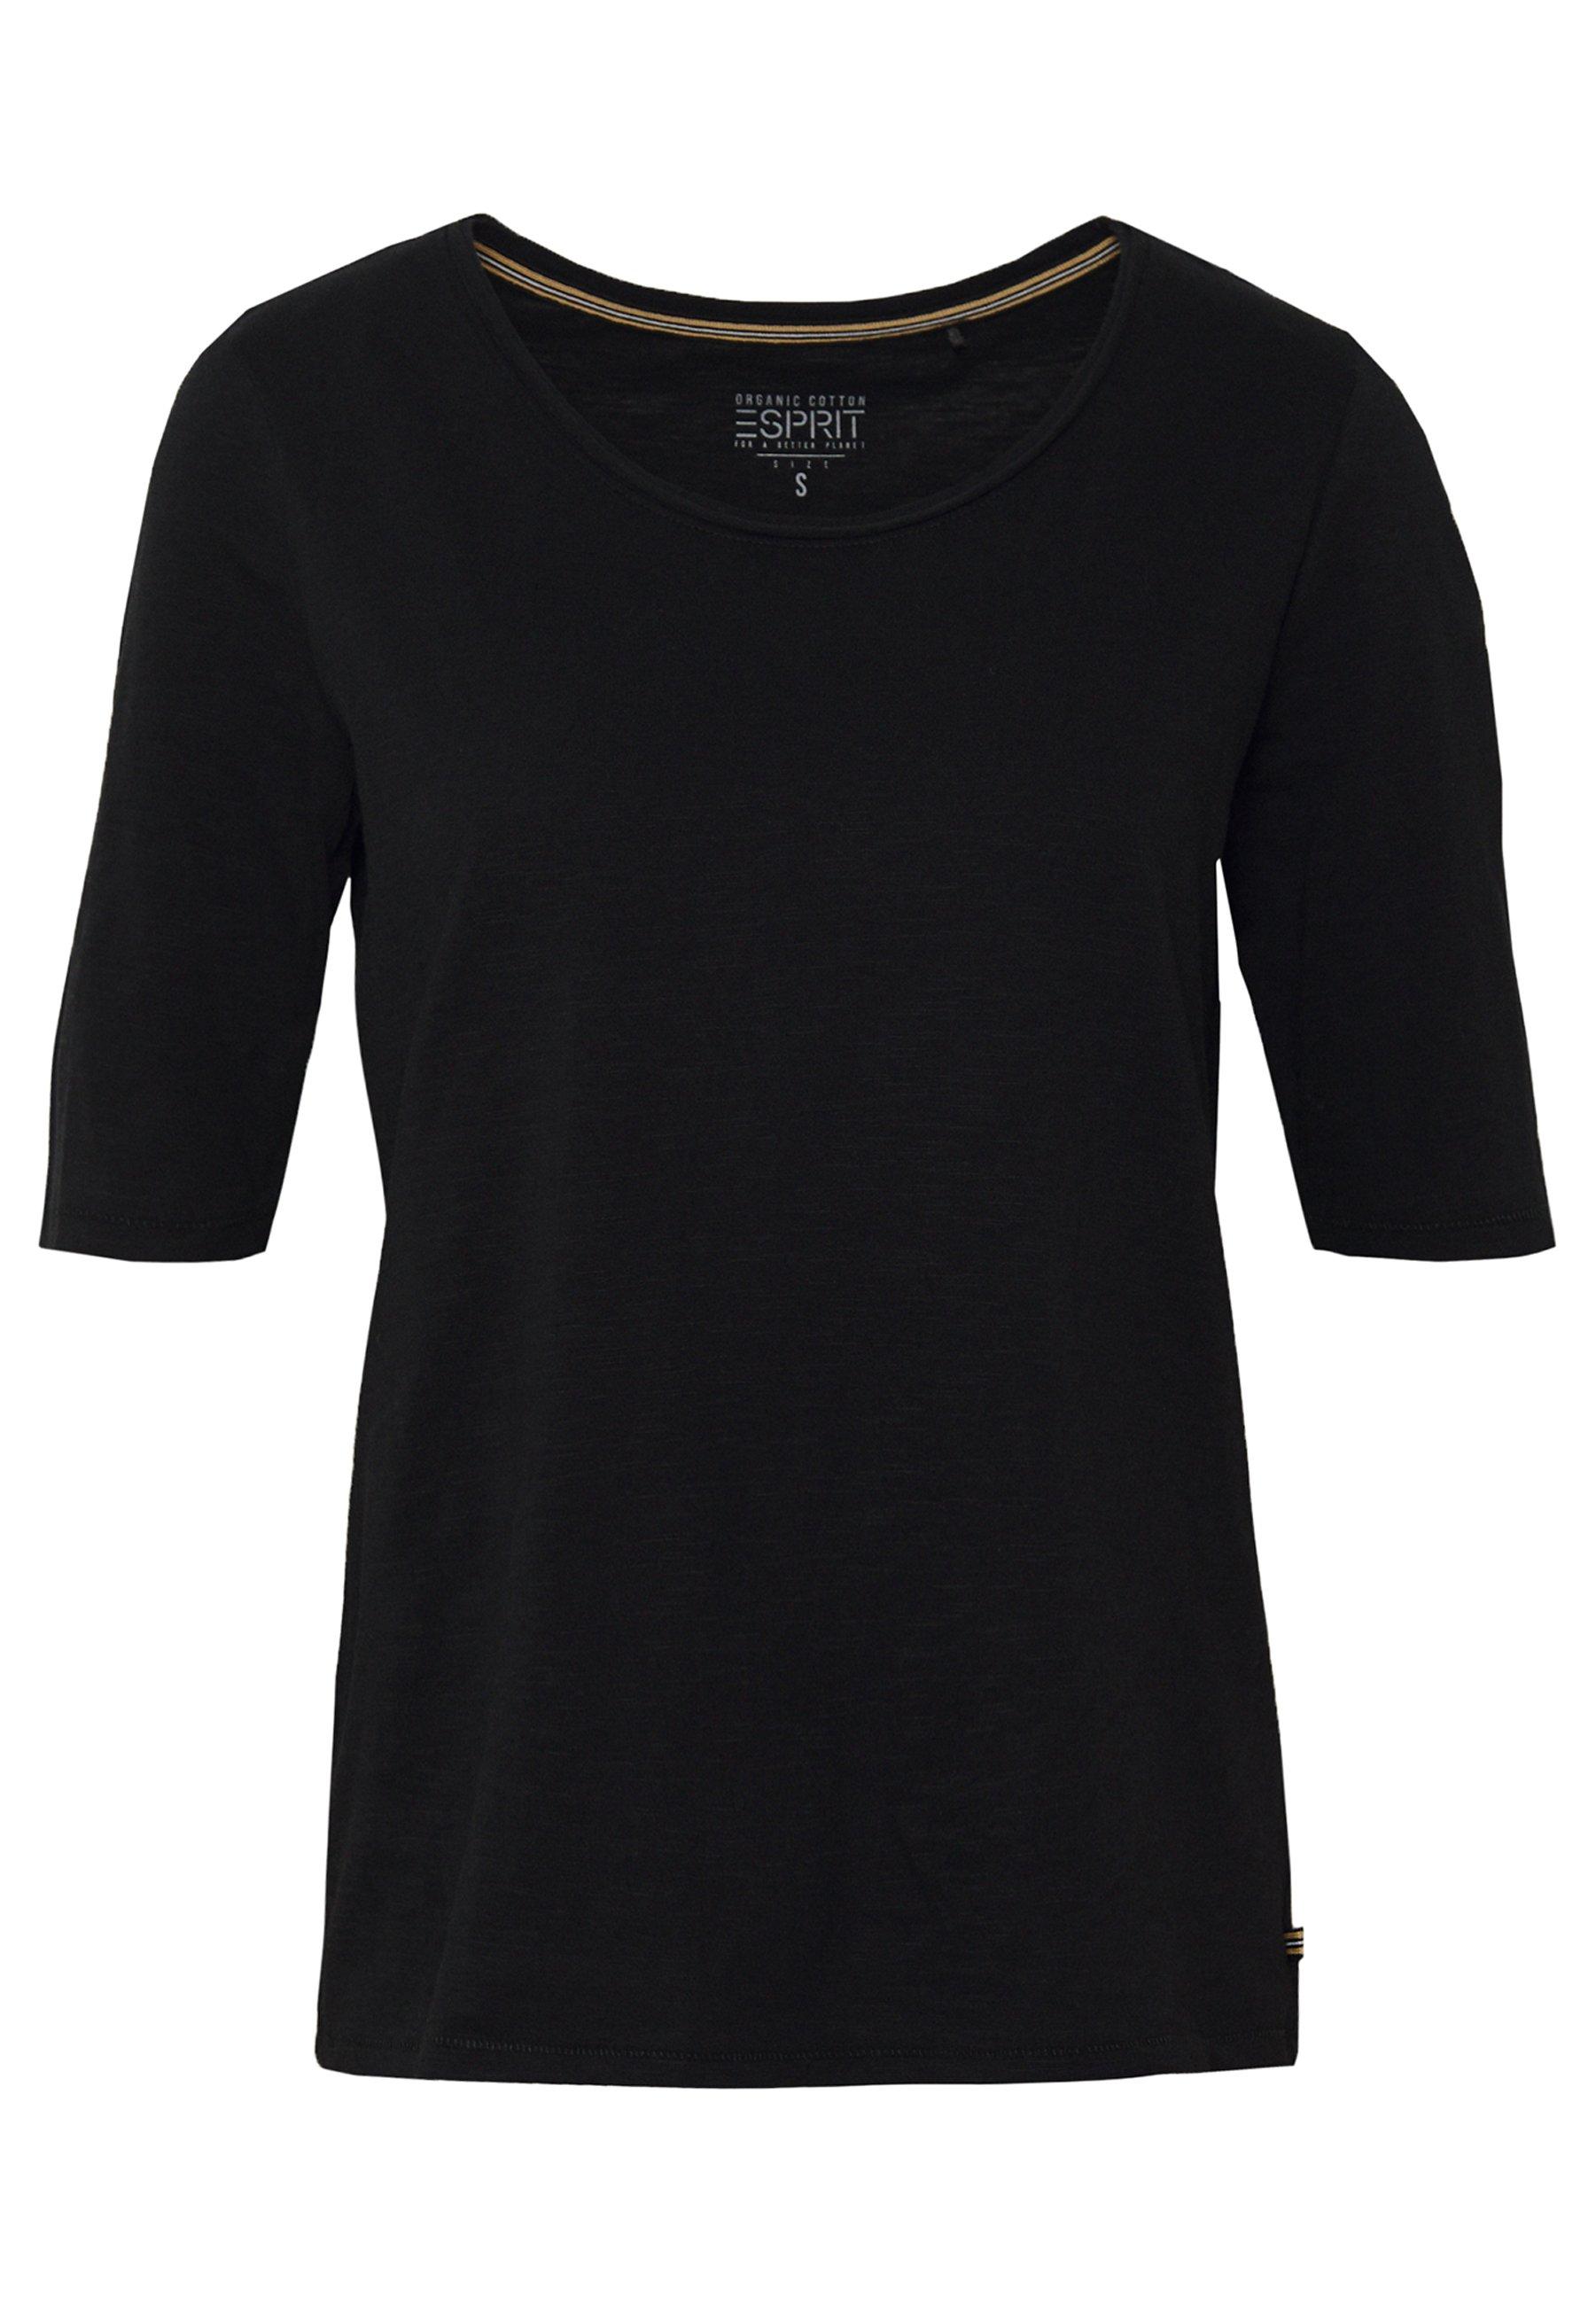 Esprit T-shirts - Black/svart